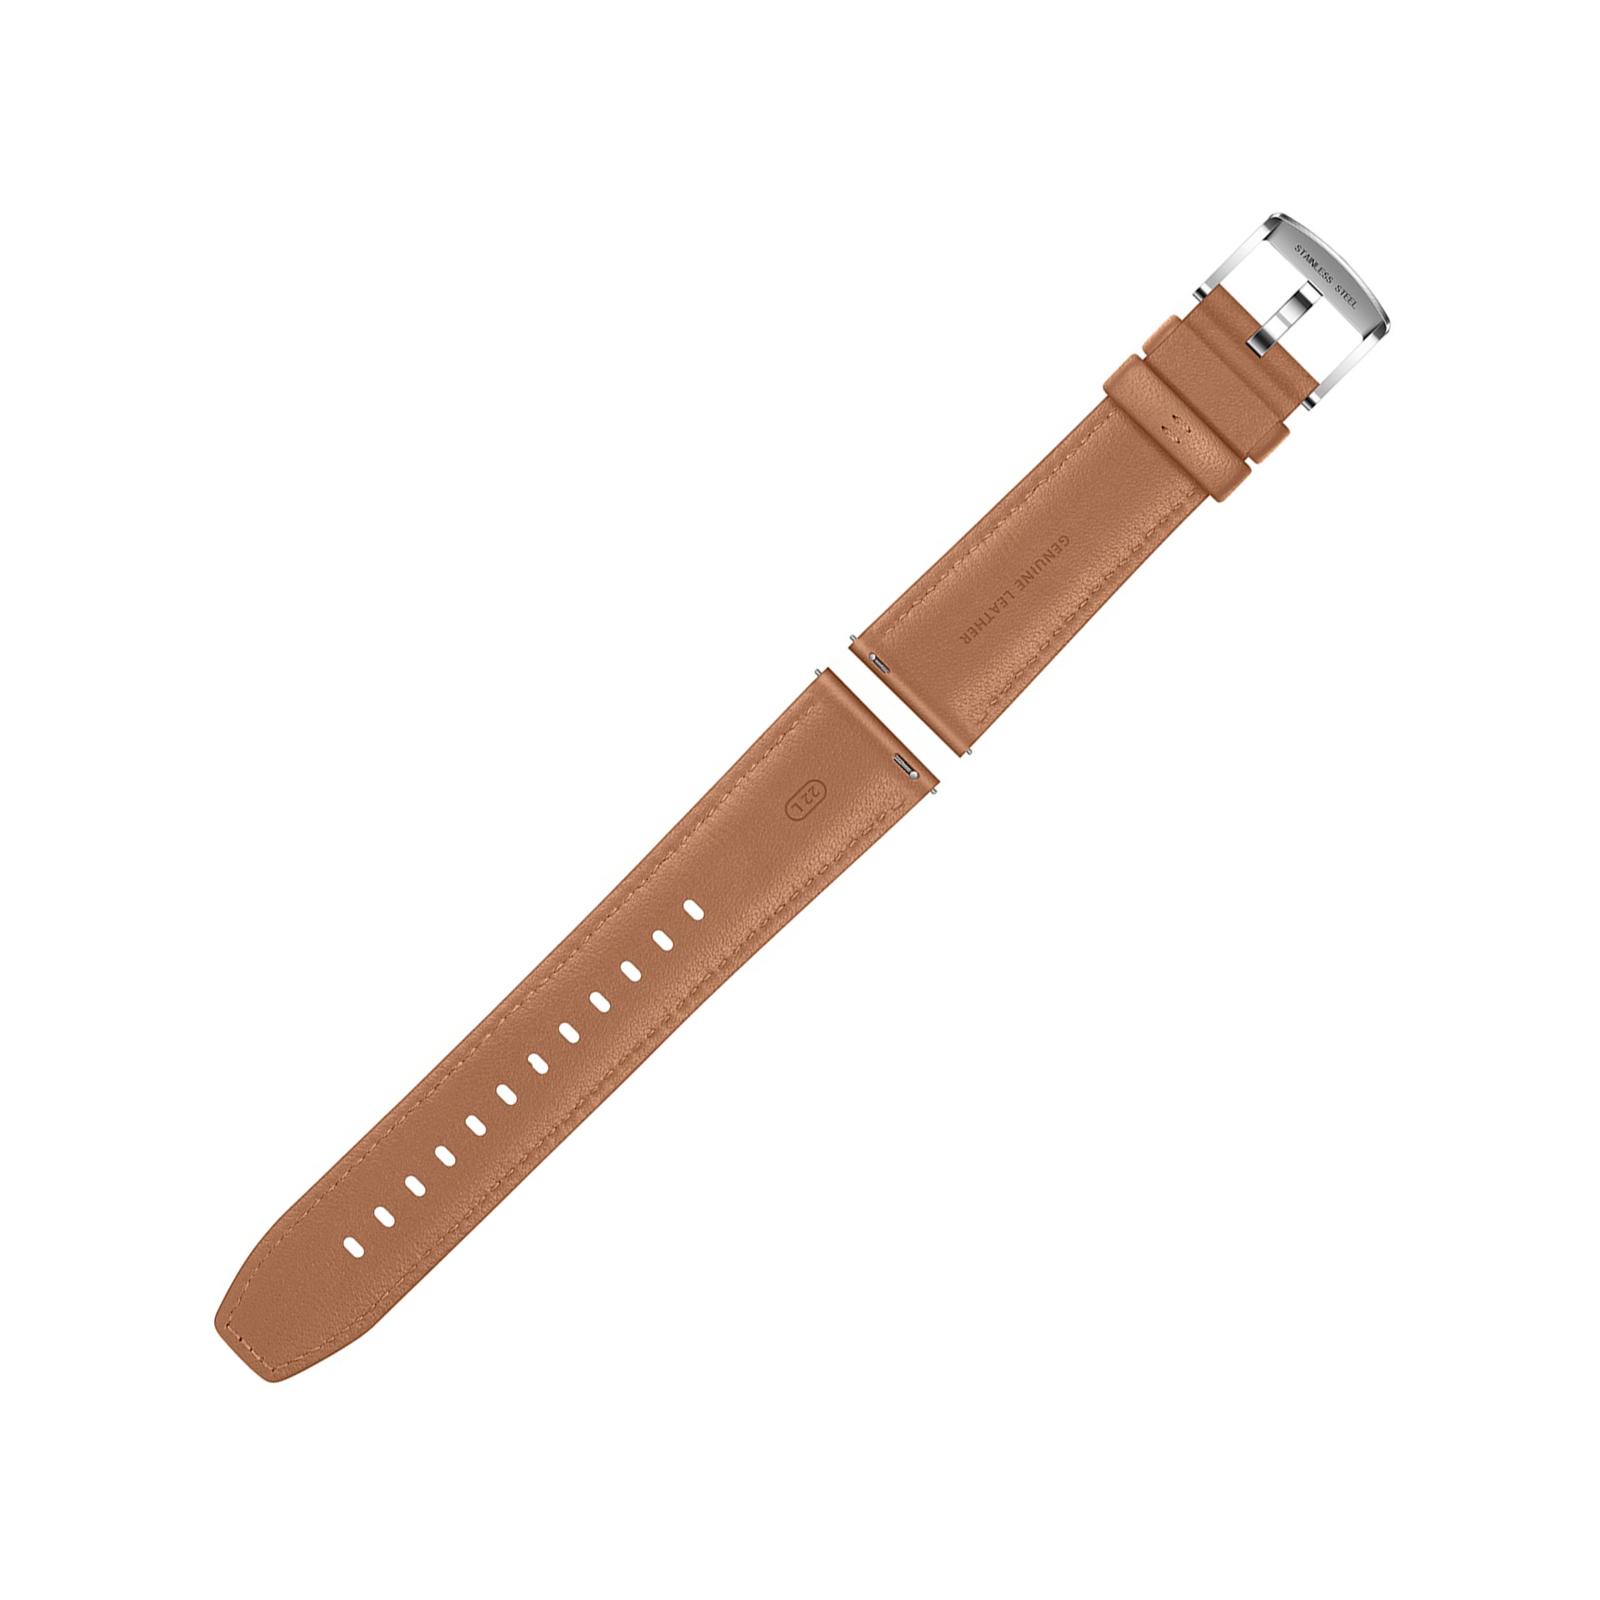 Смарт-часы Huawei Watch GT 2 46mm Classic Silver BROWN шкіра (Latona-B19V) (55024470) изображение 7